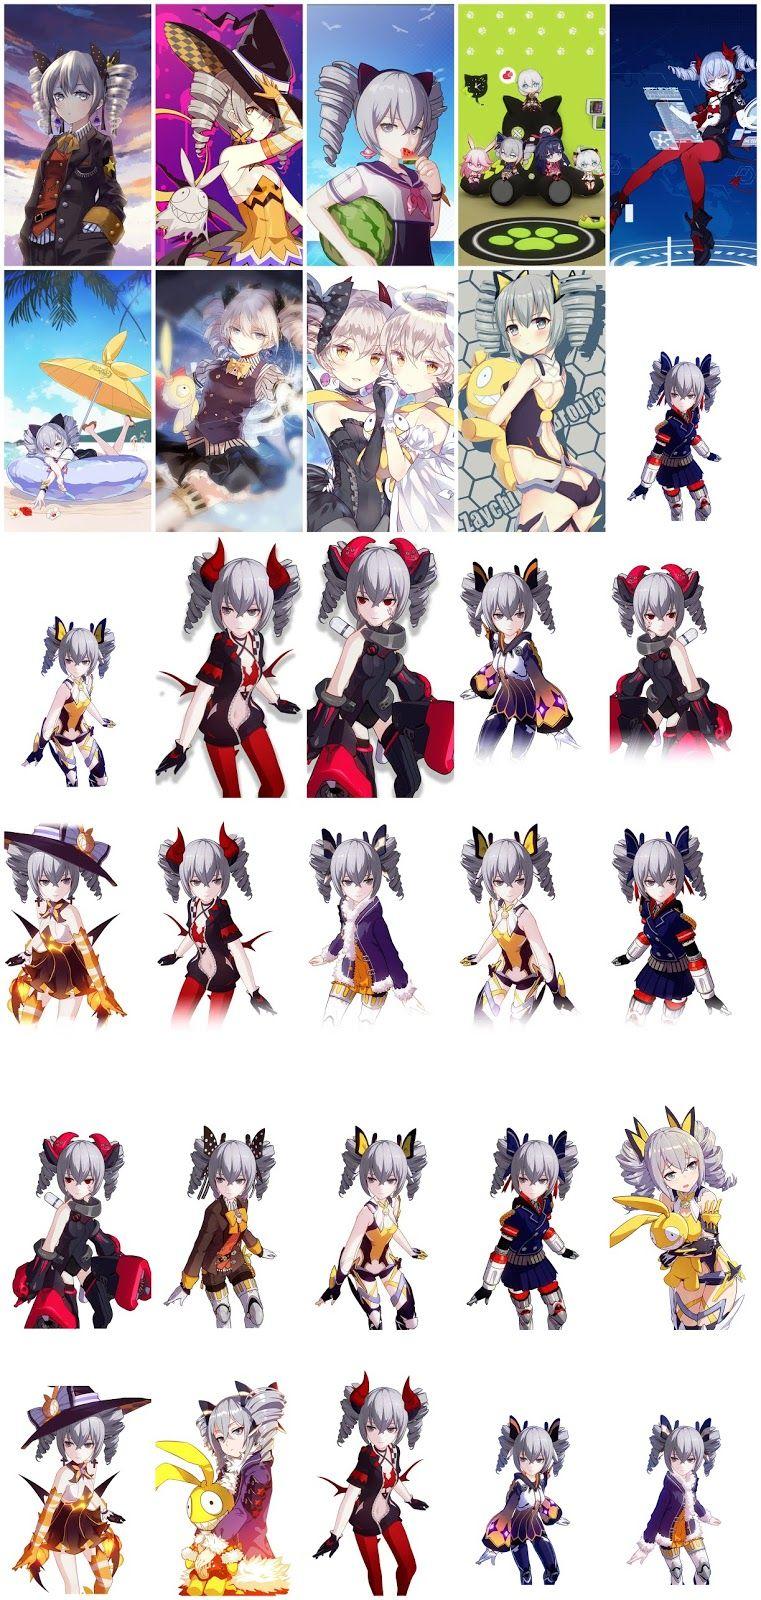 Honkai Impact 3 (Bronya Zaychik) Wallpaper Pack For Mobile